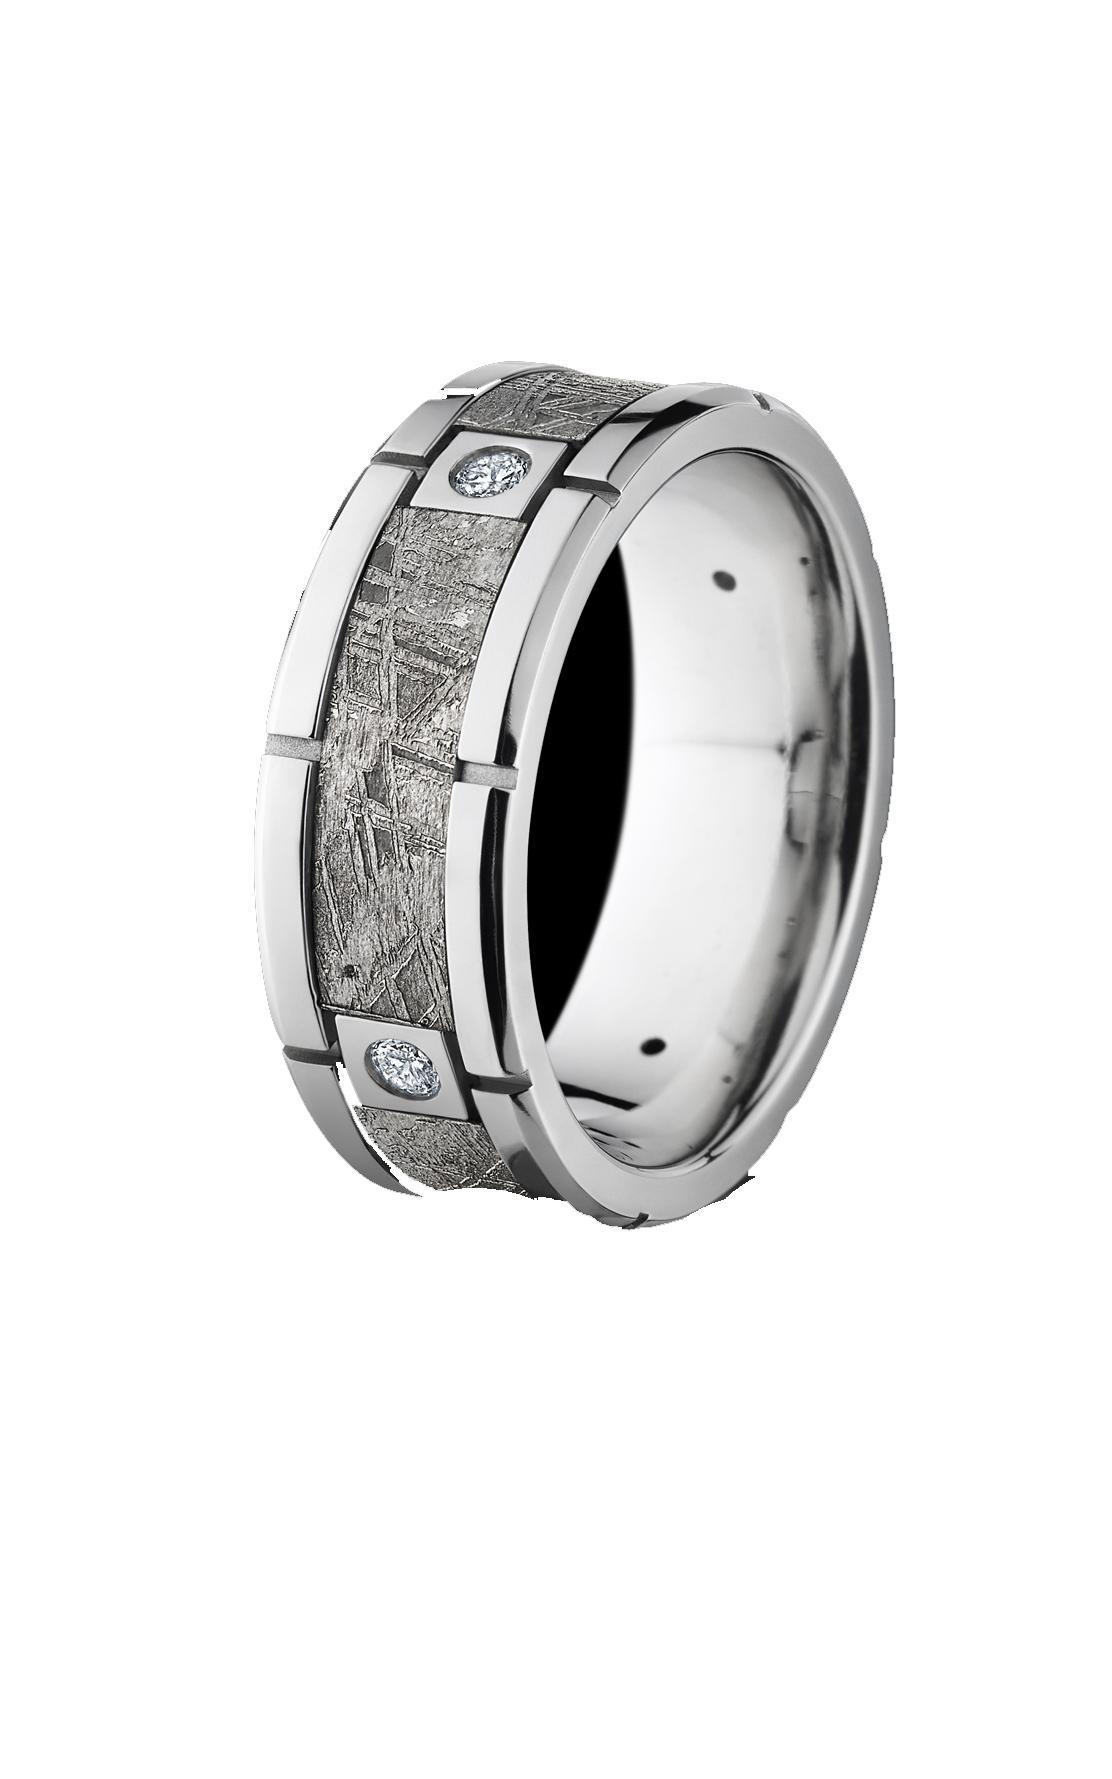 Lashbrook Precious Metals 90123 product image